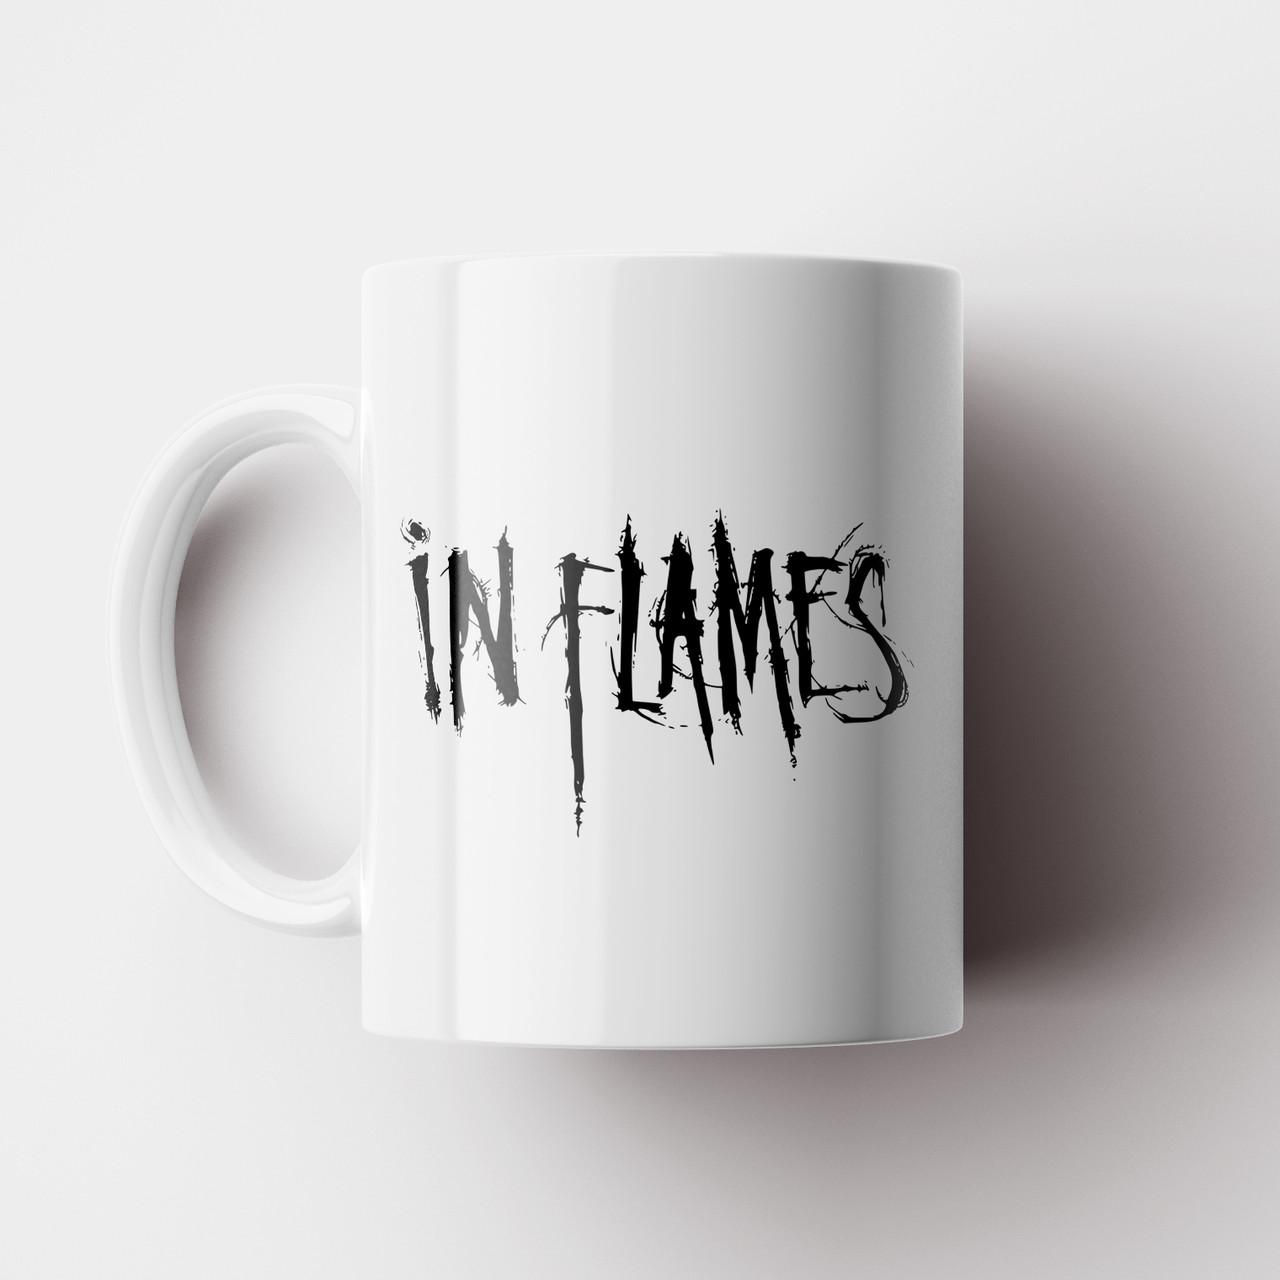 Чашка In Flames. Музыка. Metal. Метал. Чашка с фото